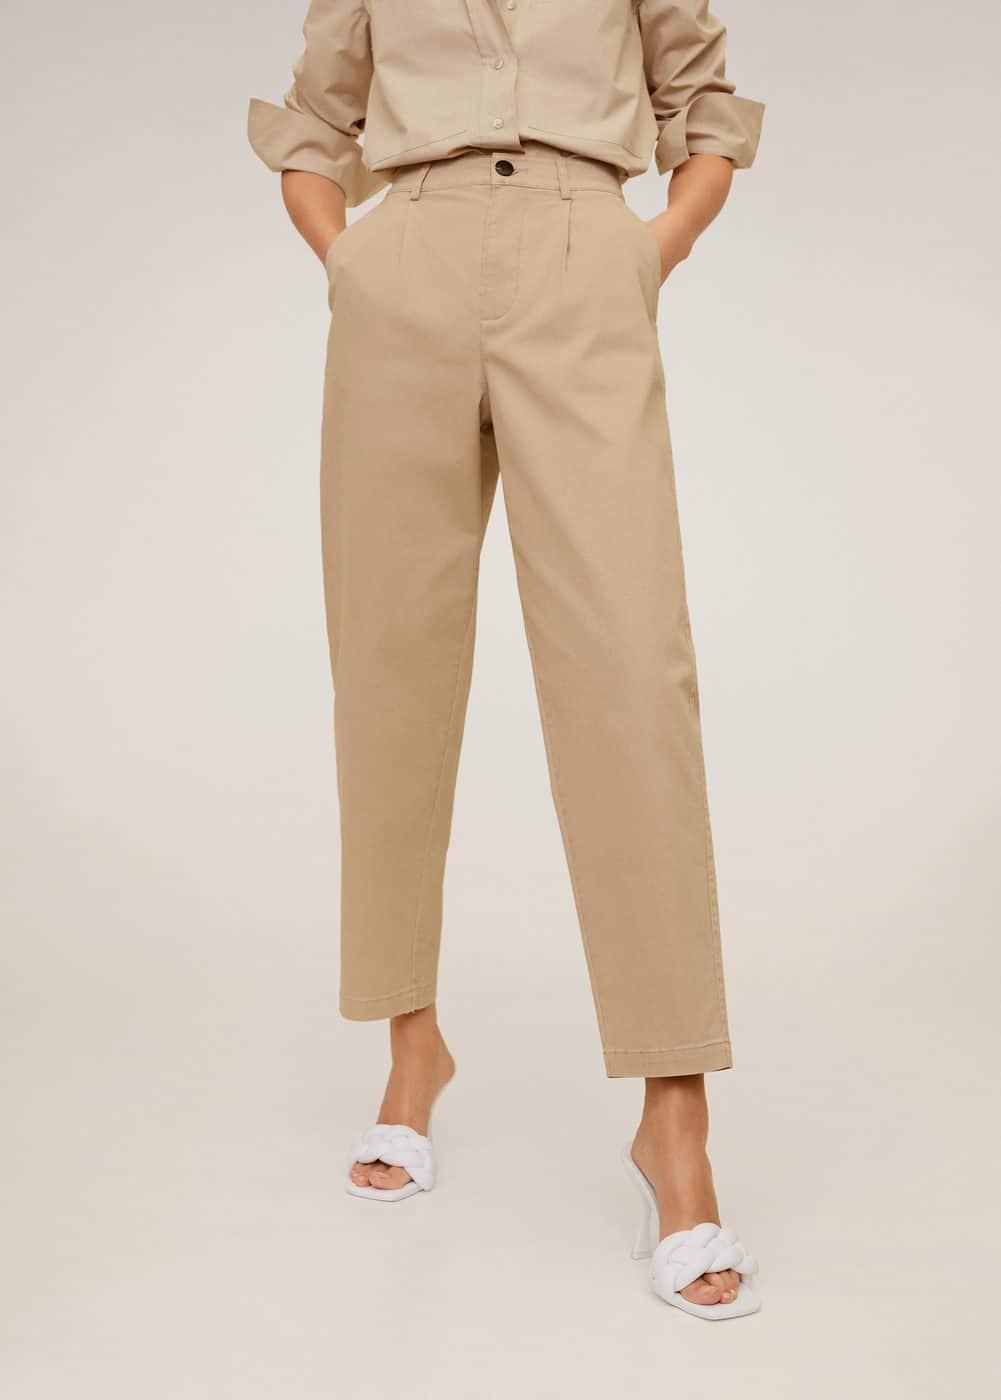 m-berlina:pantalon relaxed fit crop